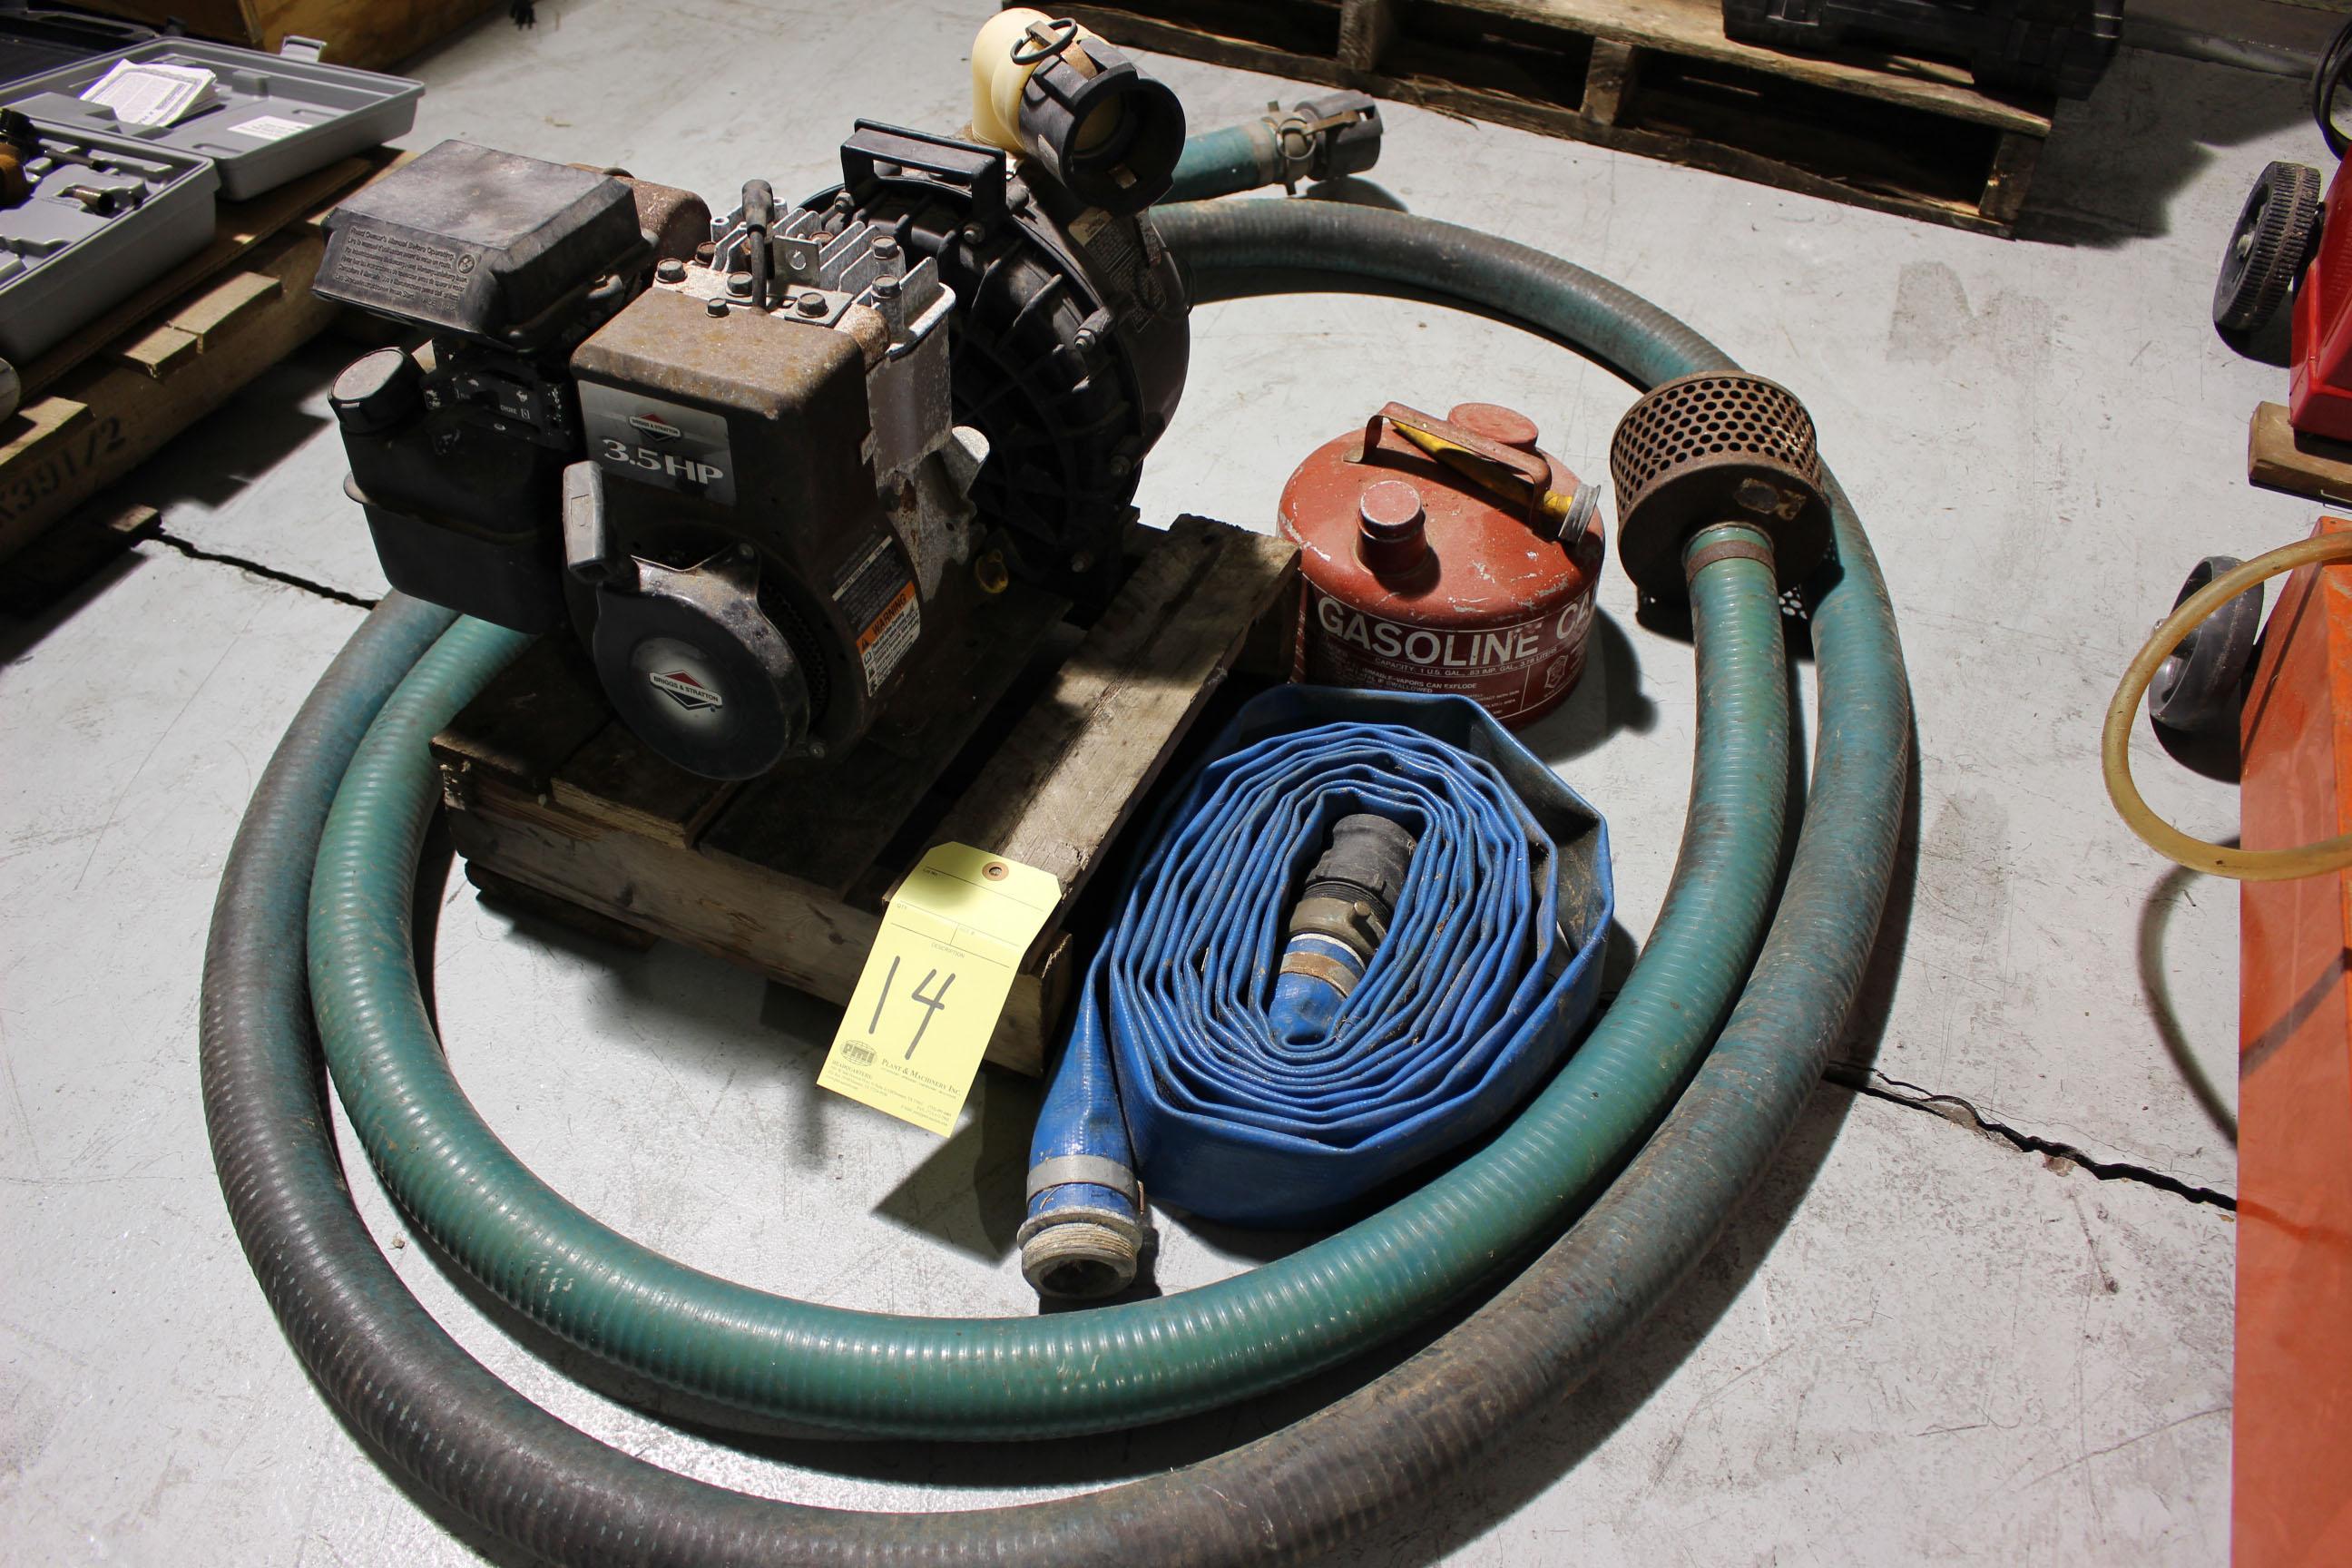 "Lot 14 - TRASH PUMP, BRIGGS & STRATTON 2"", 3.5 HP, w/hose"